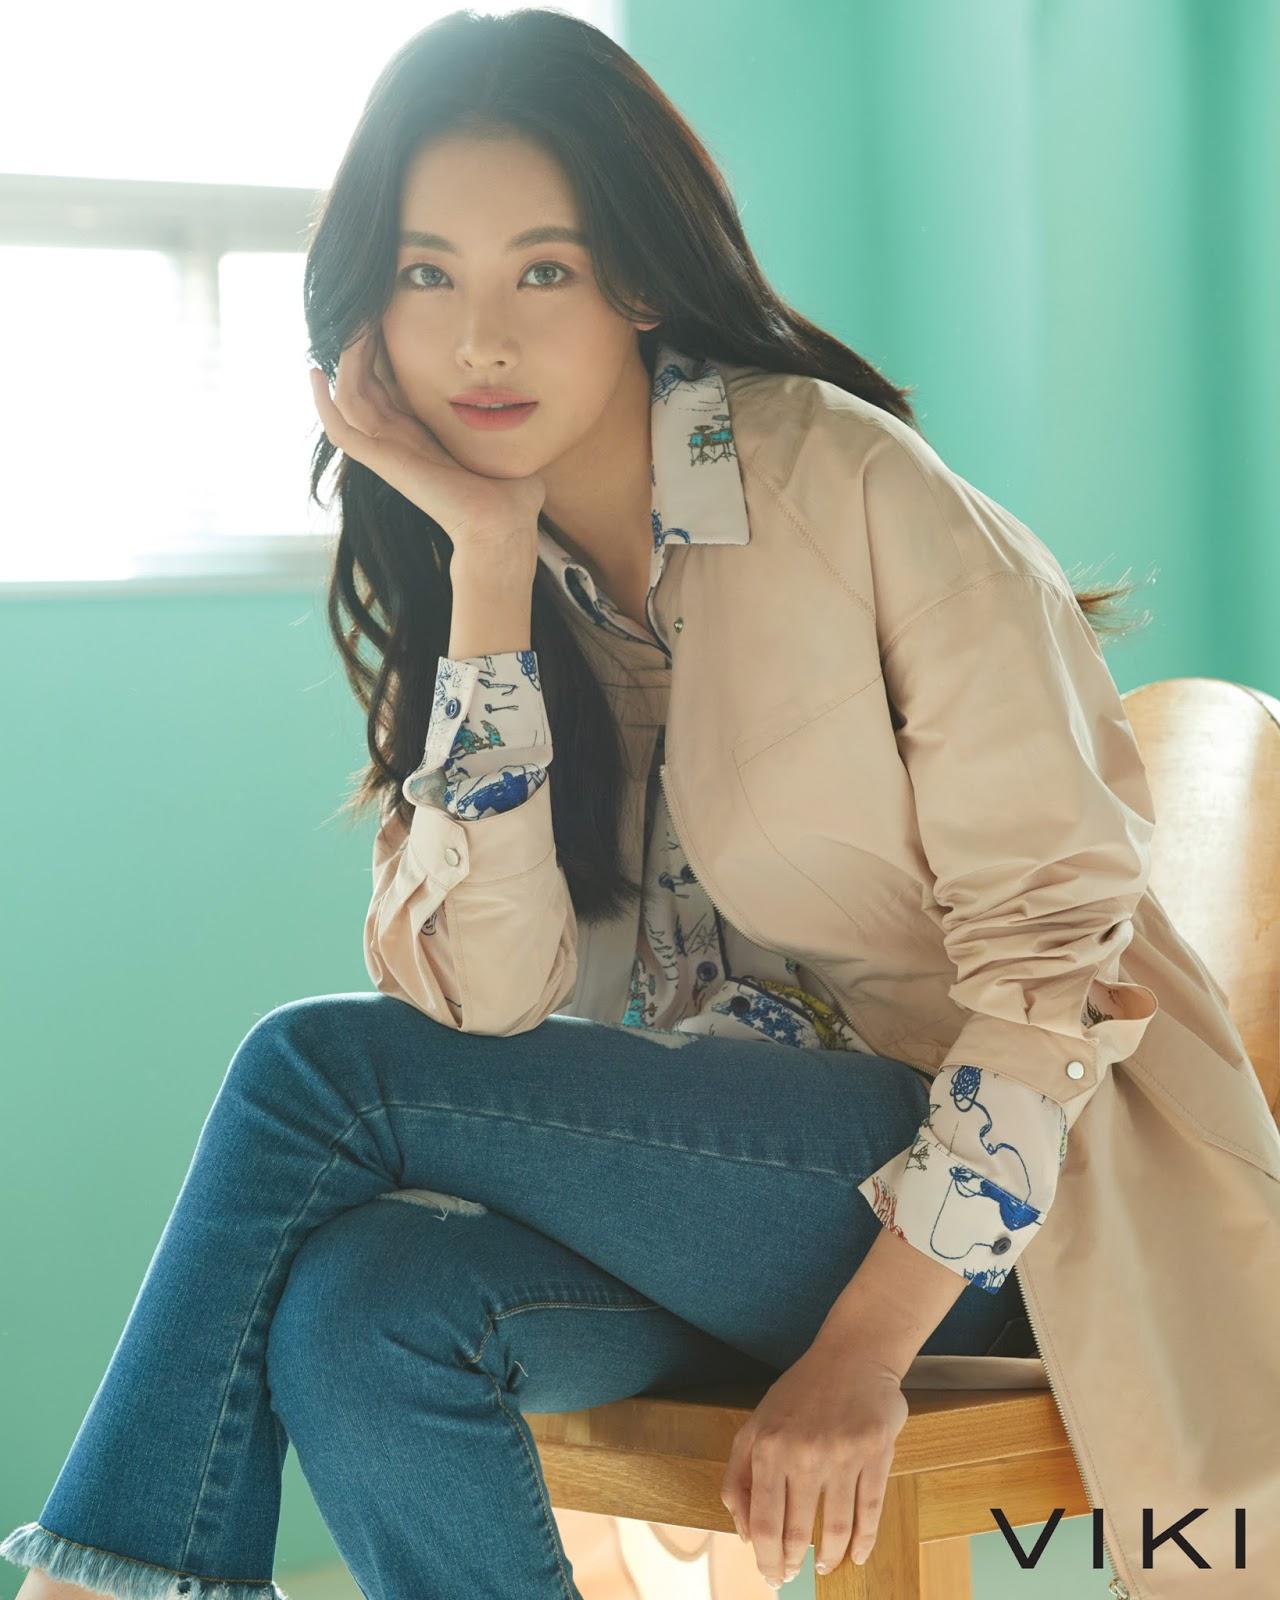 Oh Yeon Seo VIKI 2017 Fall / Winter: Daily Korean ShowBiz News